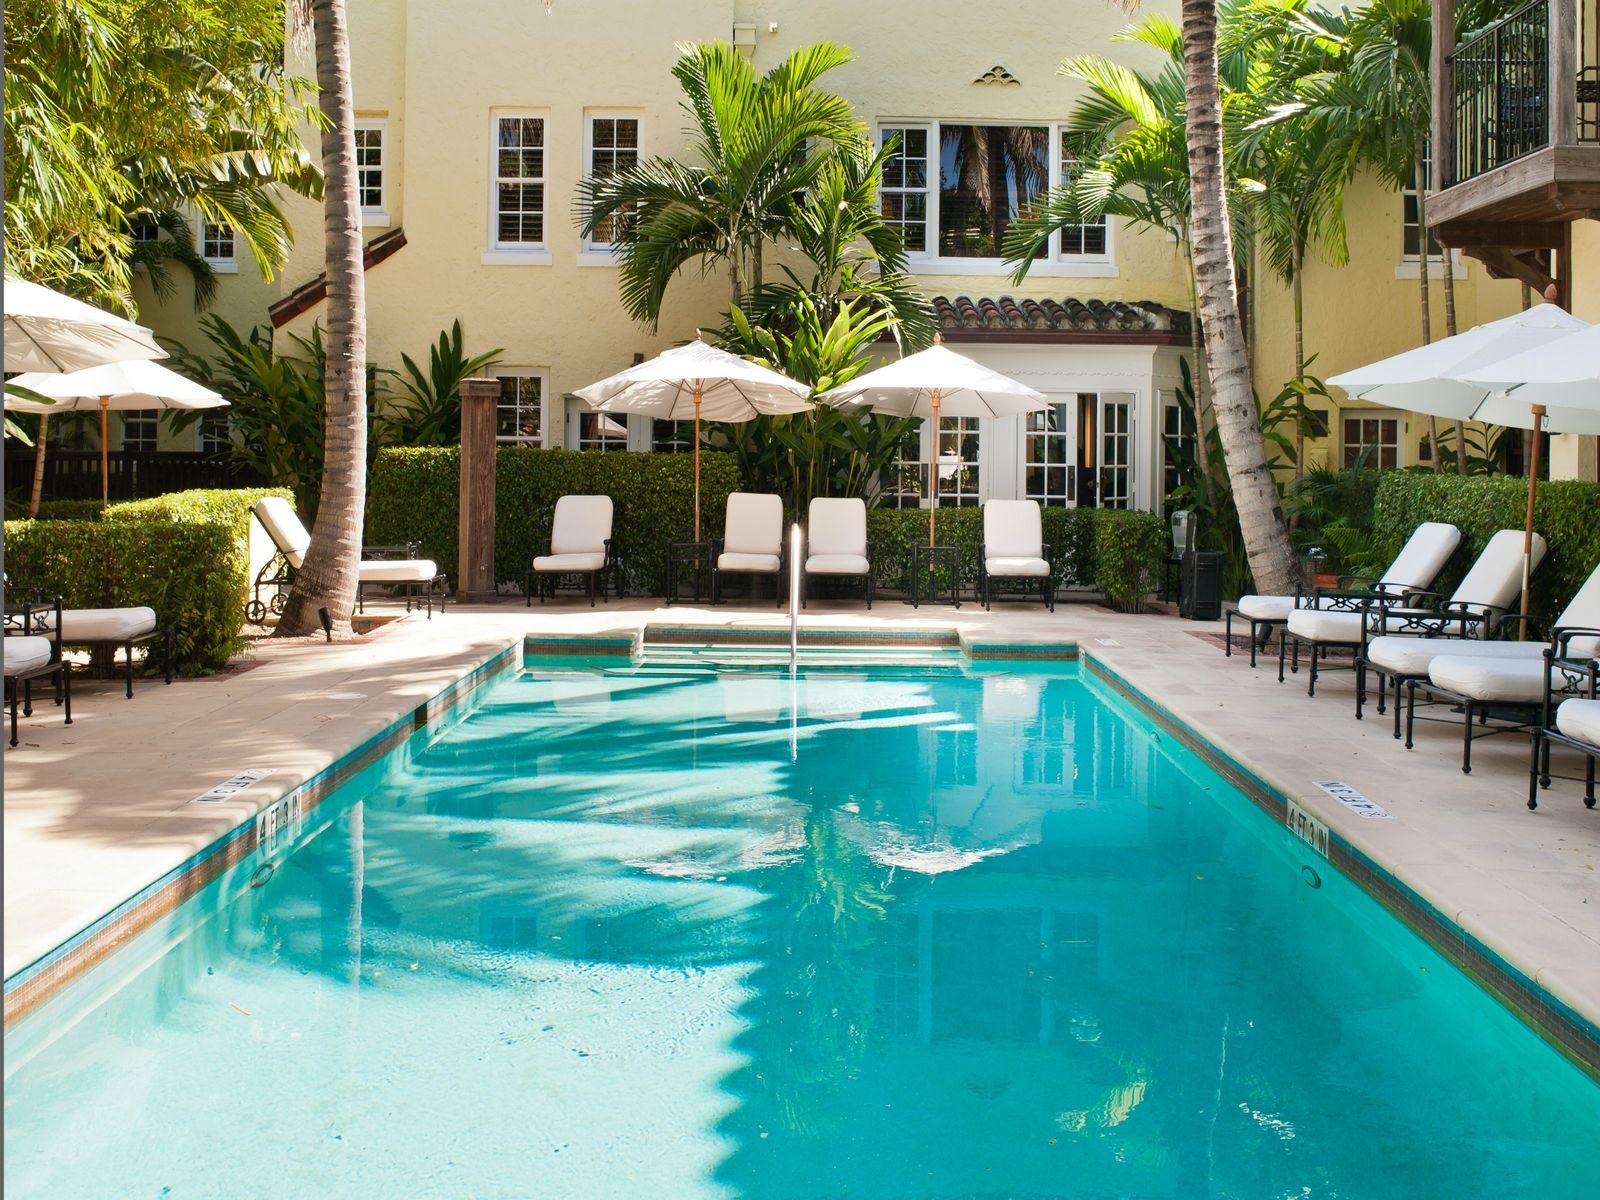 Brazilian Court and Hotel Condominium